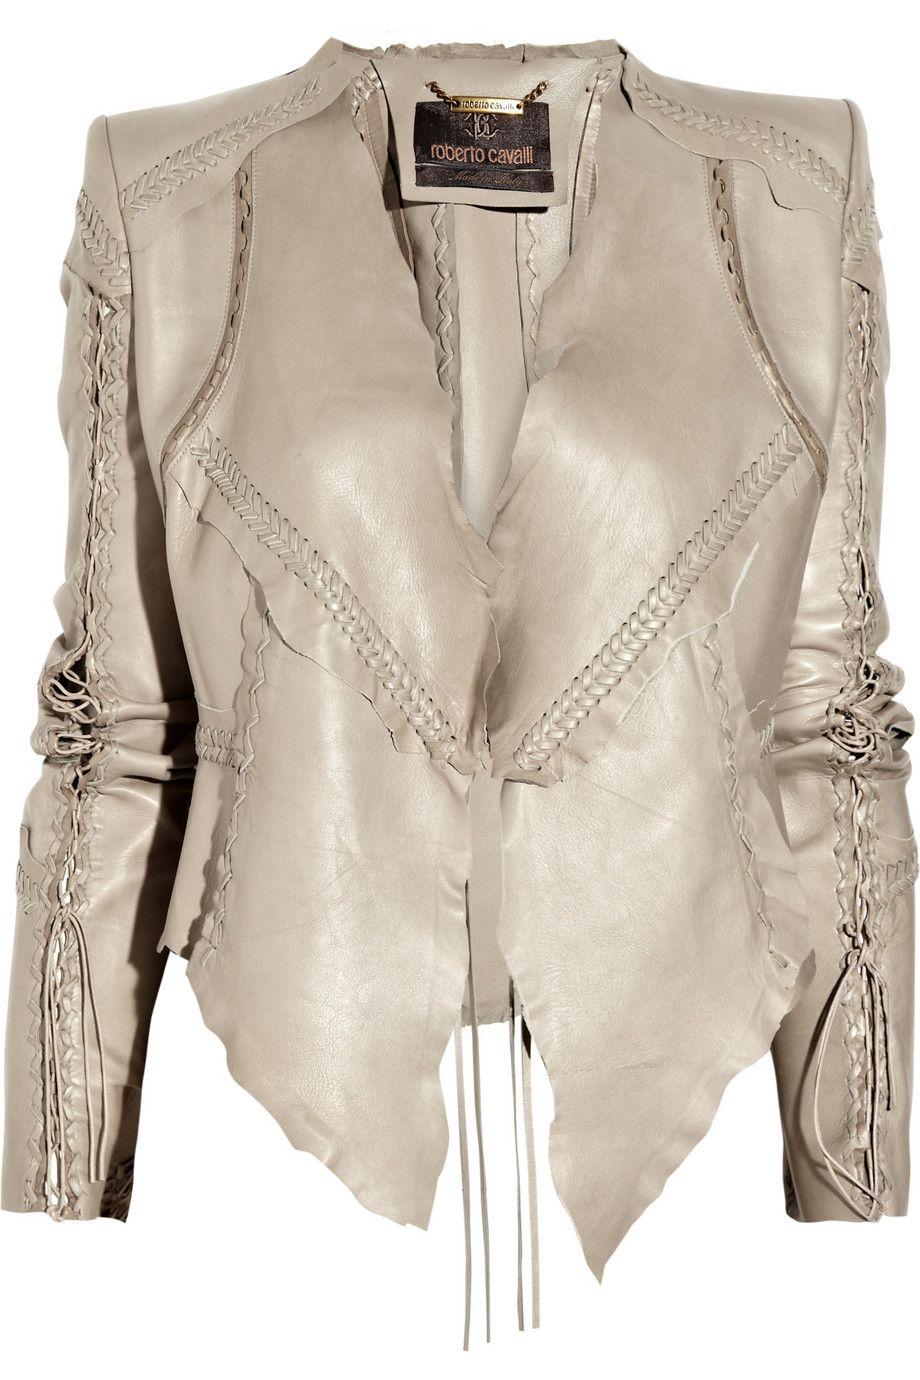 Roberto Cavalli lace-up leather jacket-yay!  64278fa30